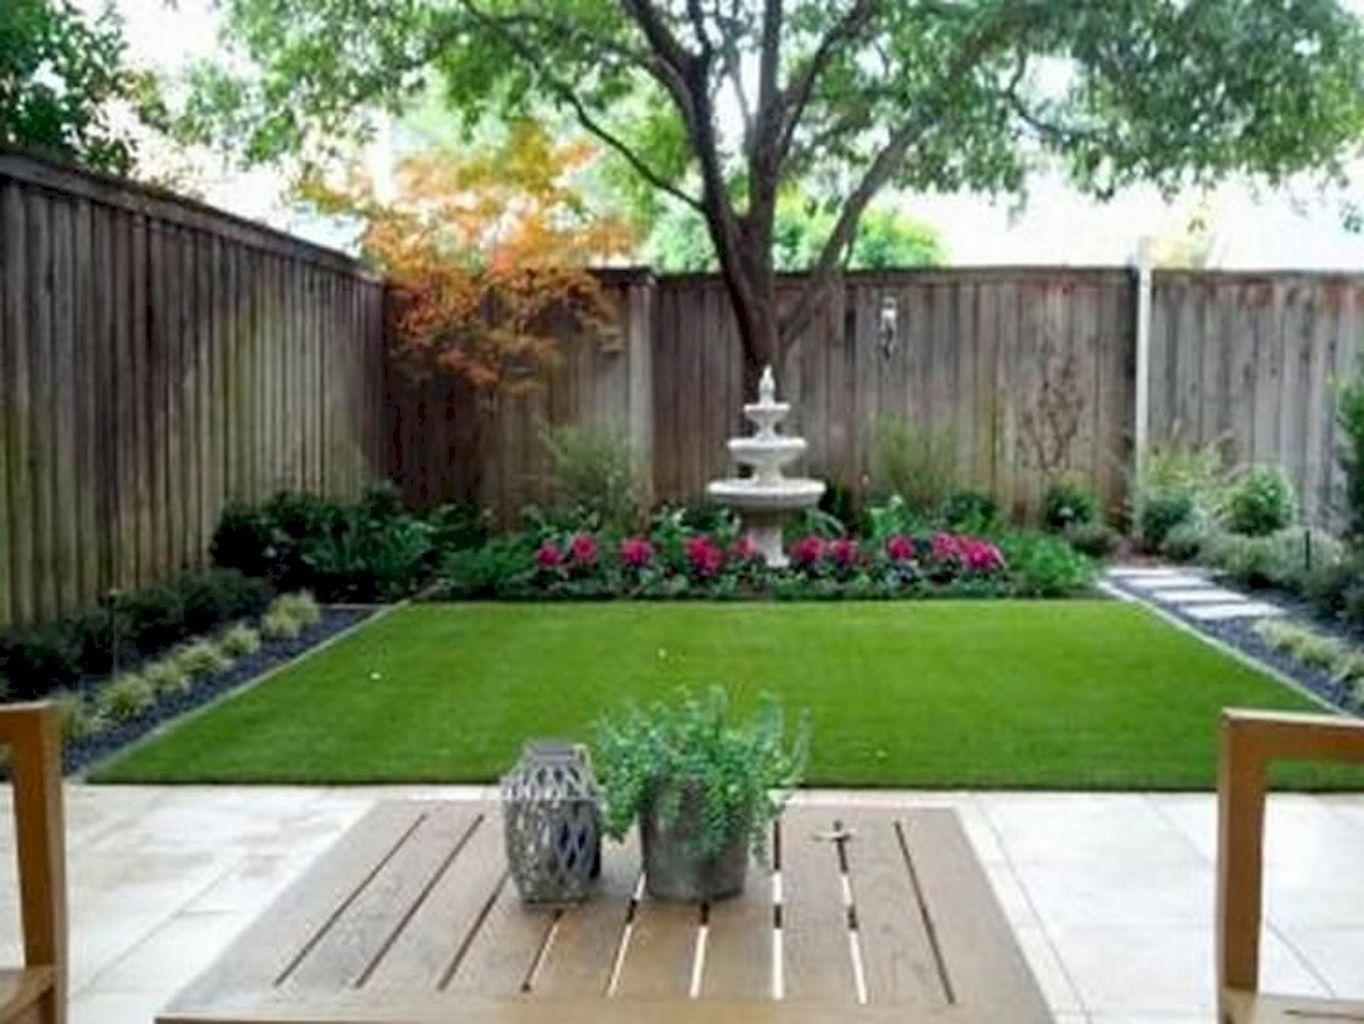 Pin On Gardening Backyard garden ideas for small yards